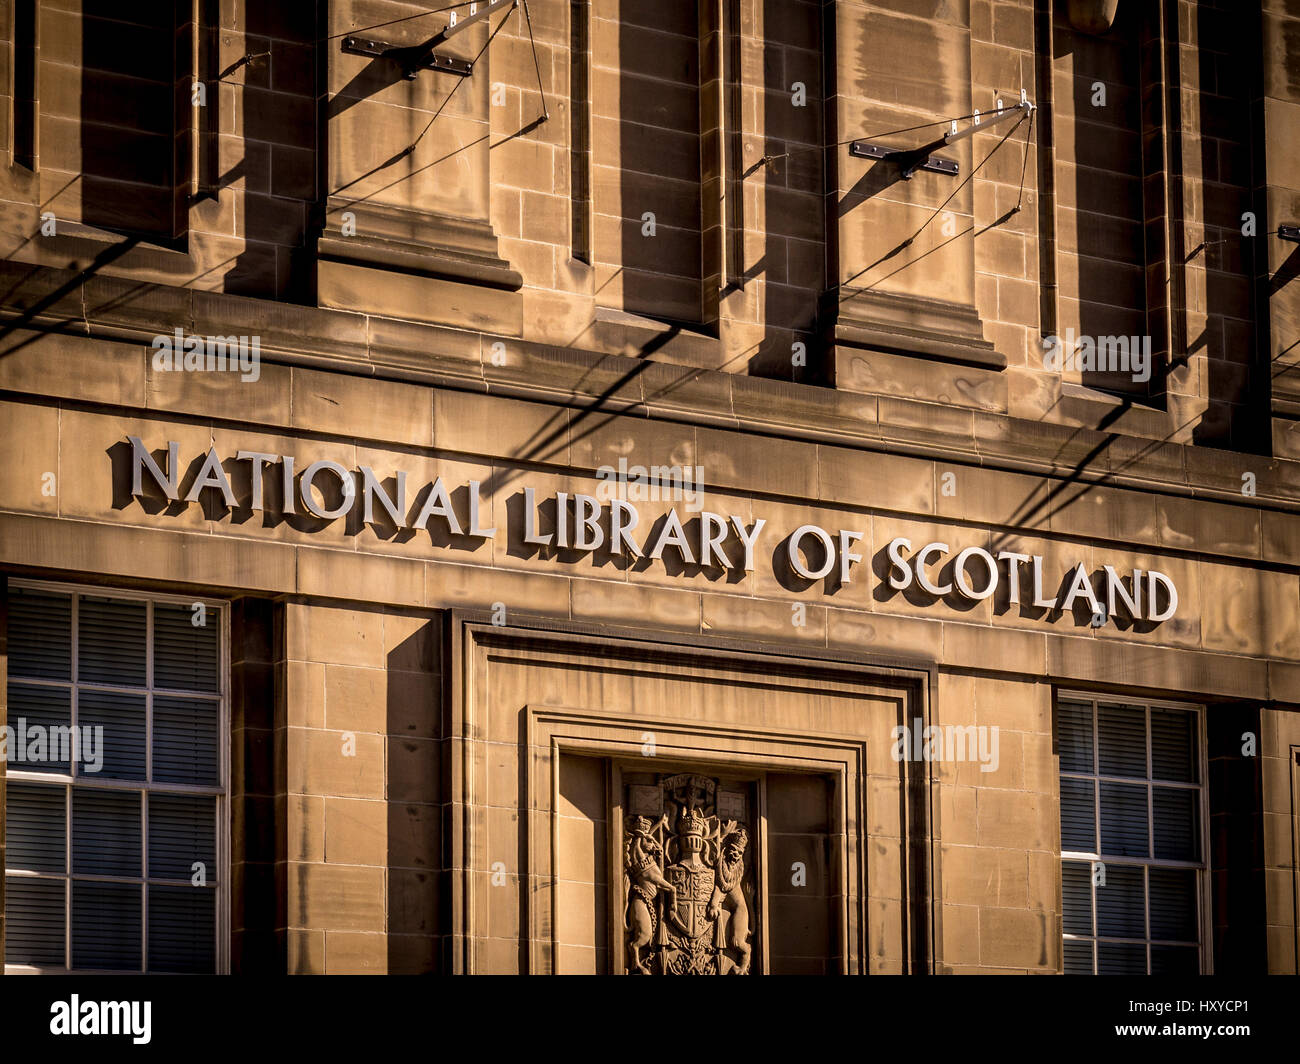 National Library of Scotland, Edinburgh, Scotland. Stock Photo